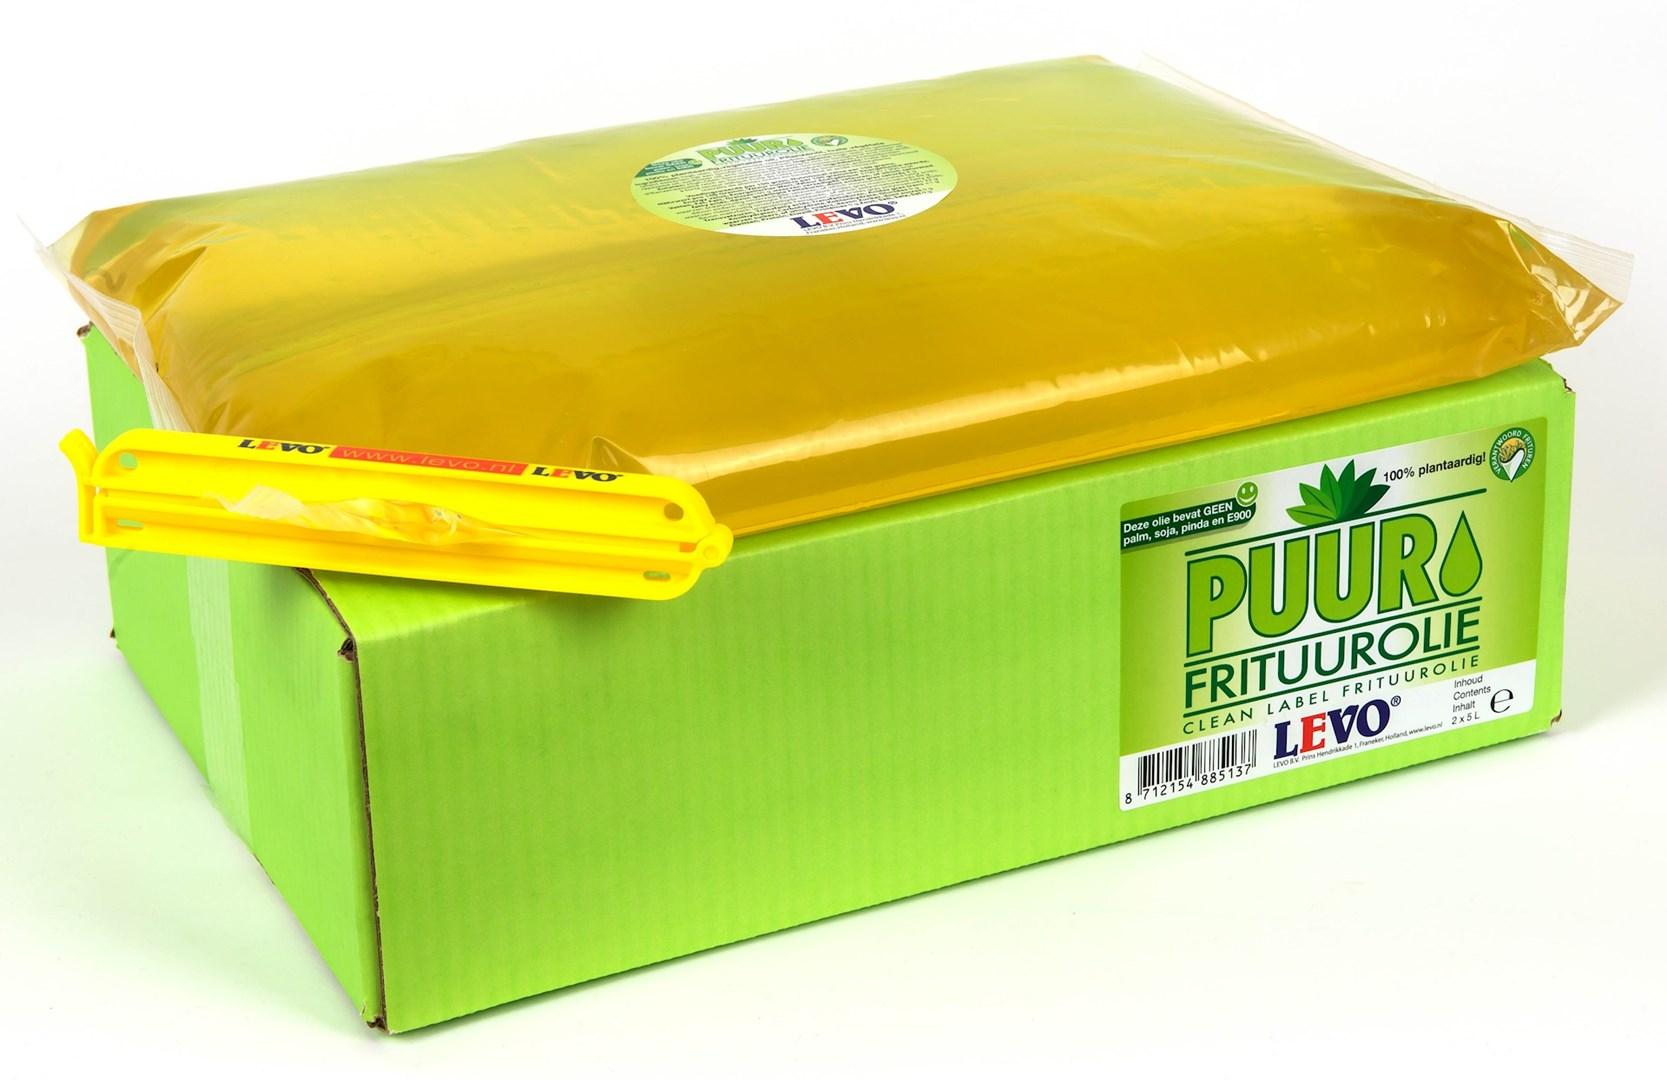 Productafbeelding PUUR frituurolie packzak